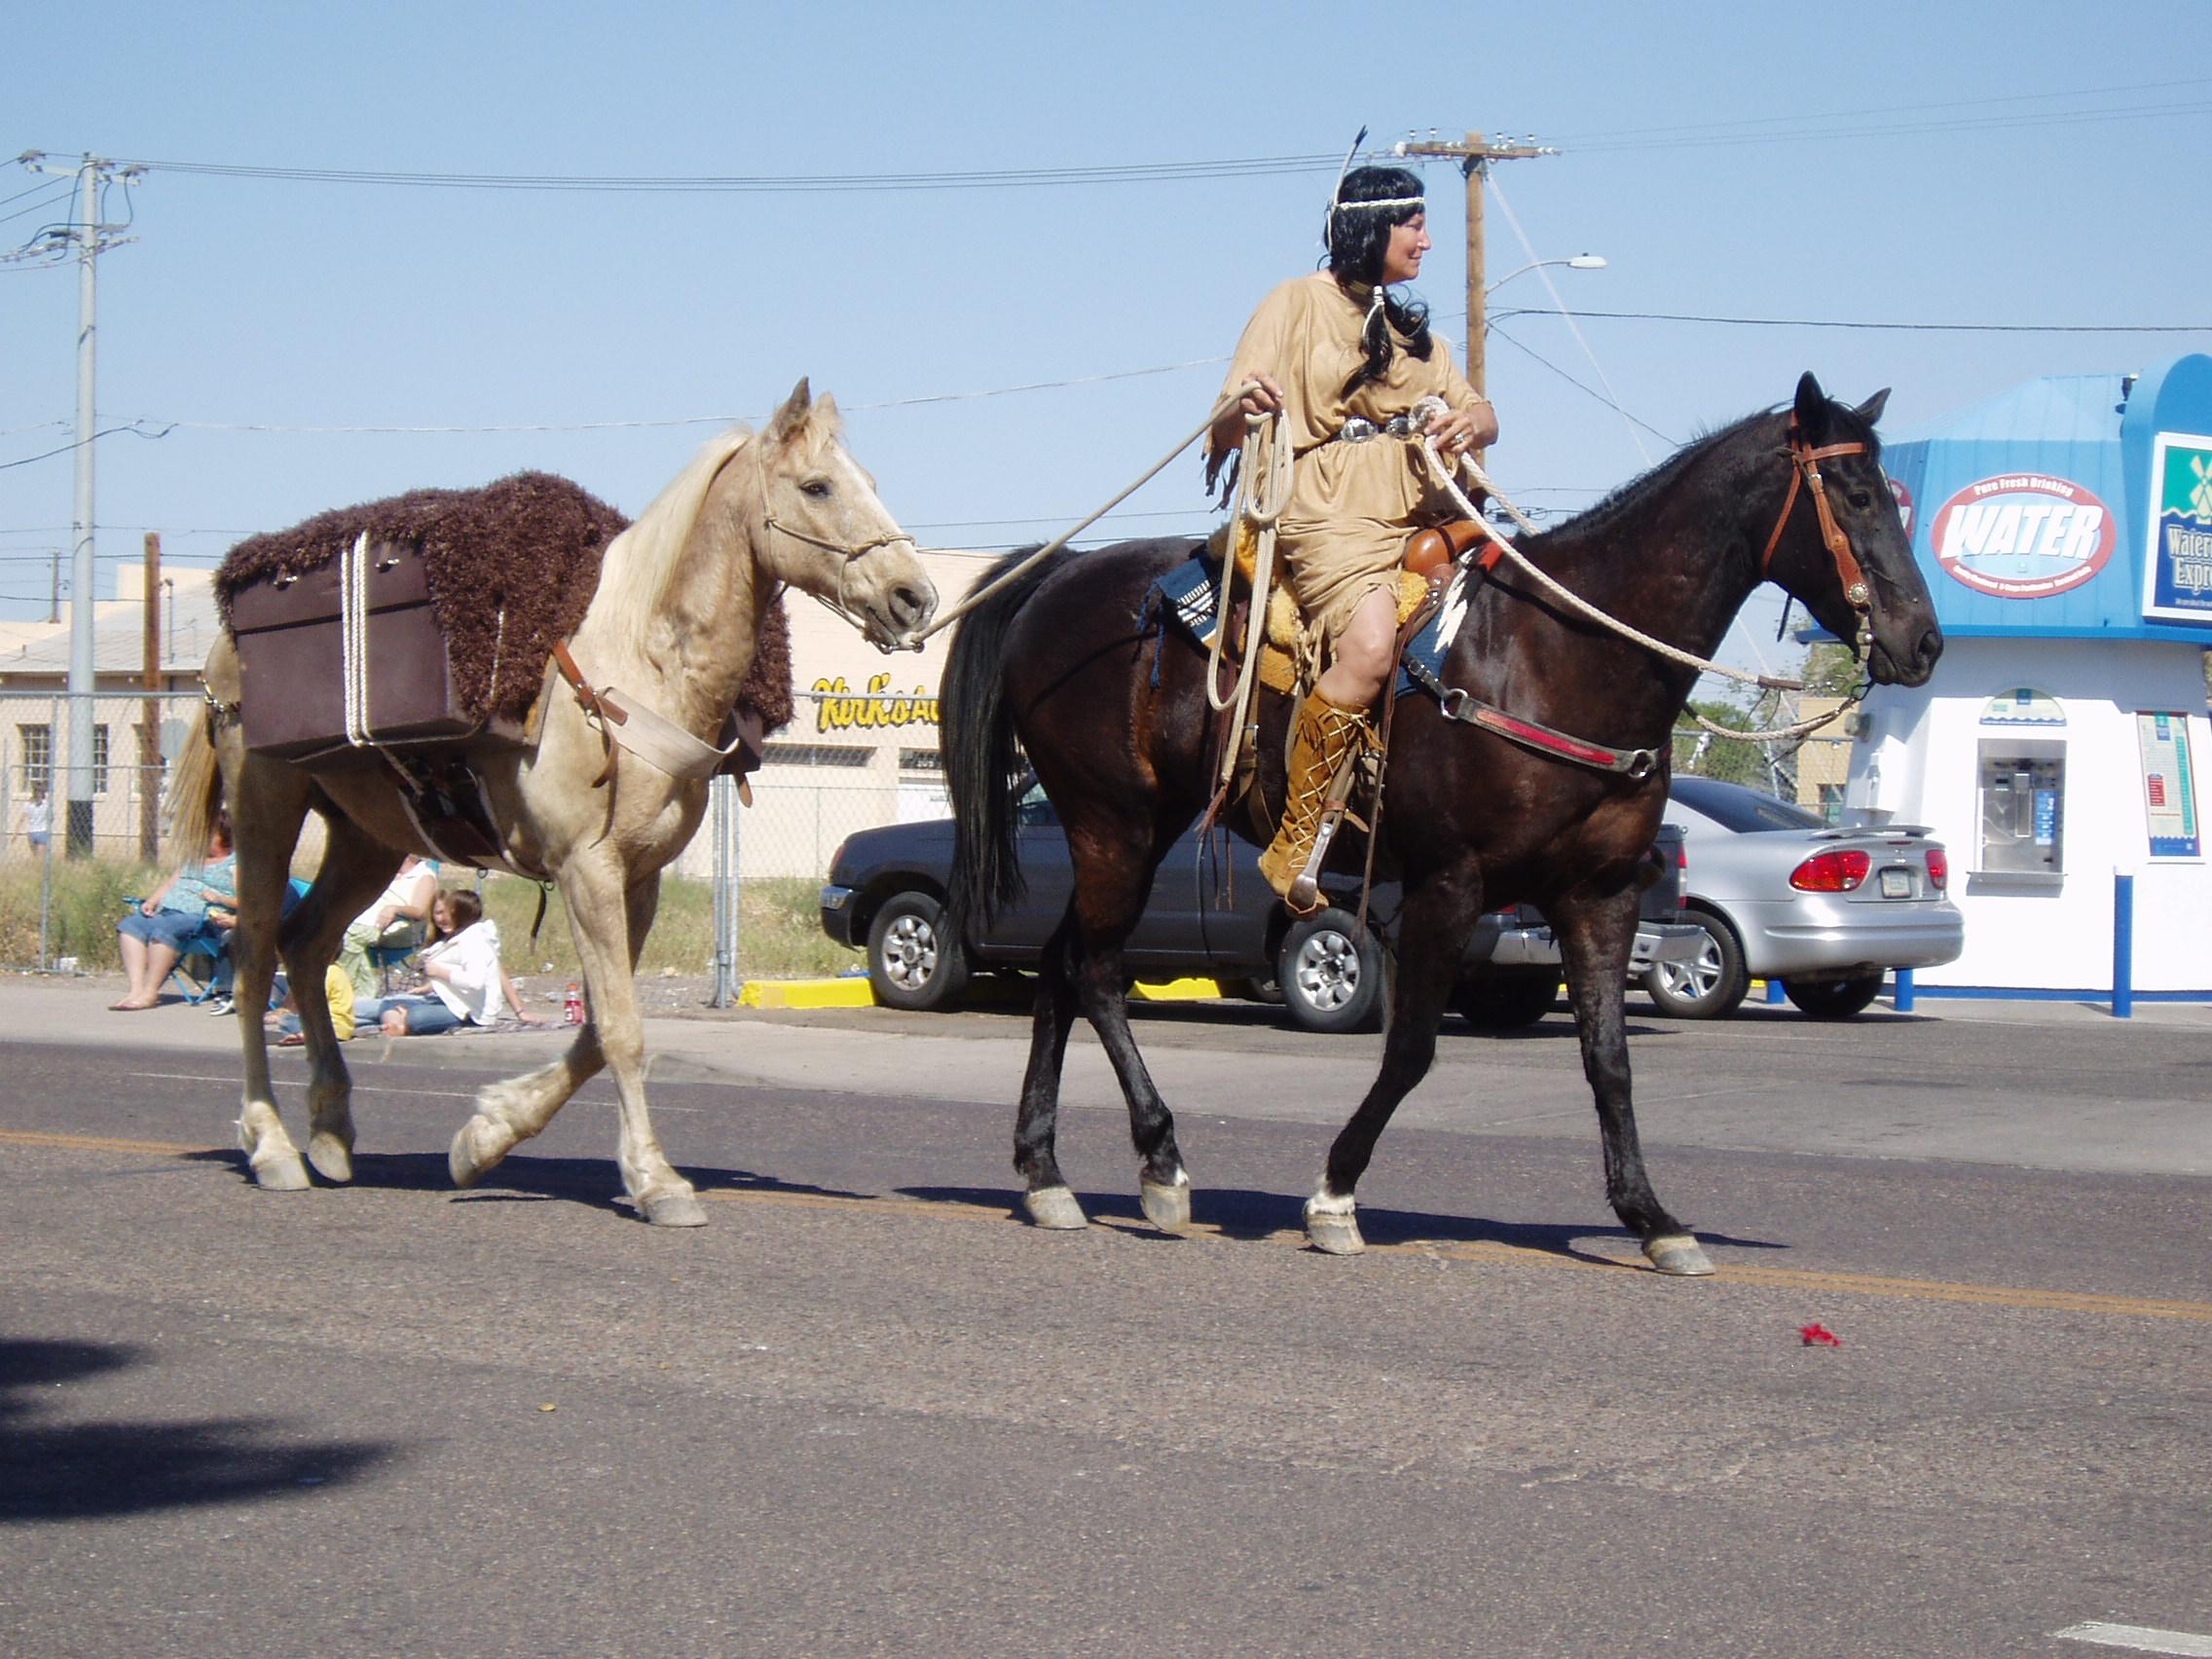 2009-03-21-buckeye-pioneer-parade-13.JPG